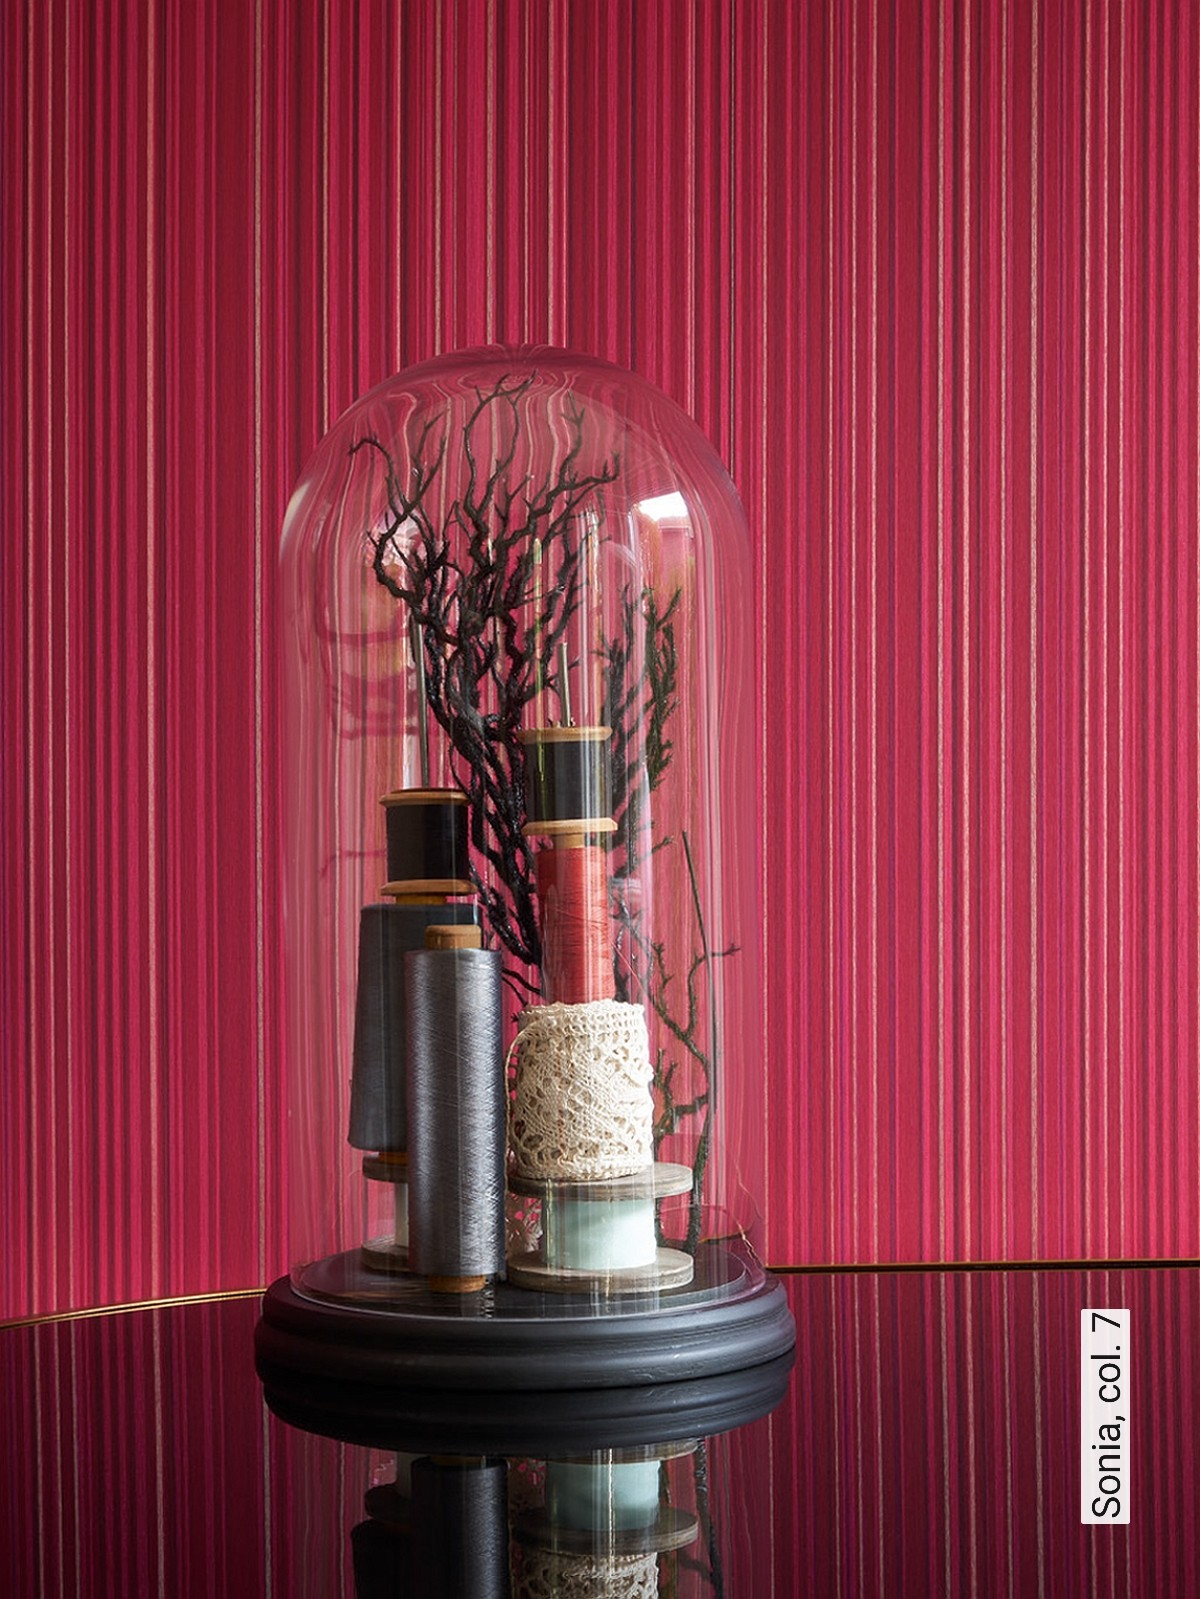 tapete sonia col 7 die tapetenagentur. Black Bedroom Furniture Sets. Home Design Ideas